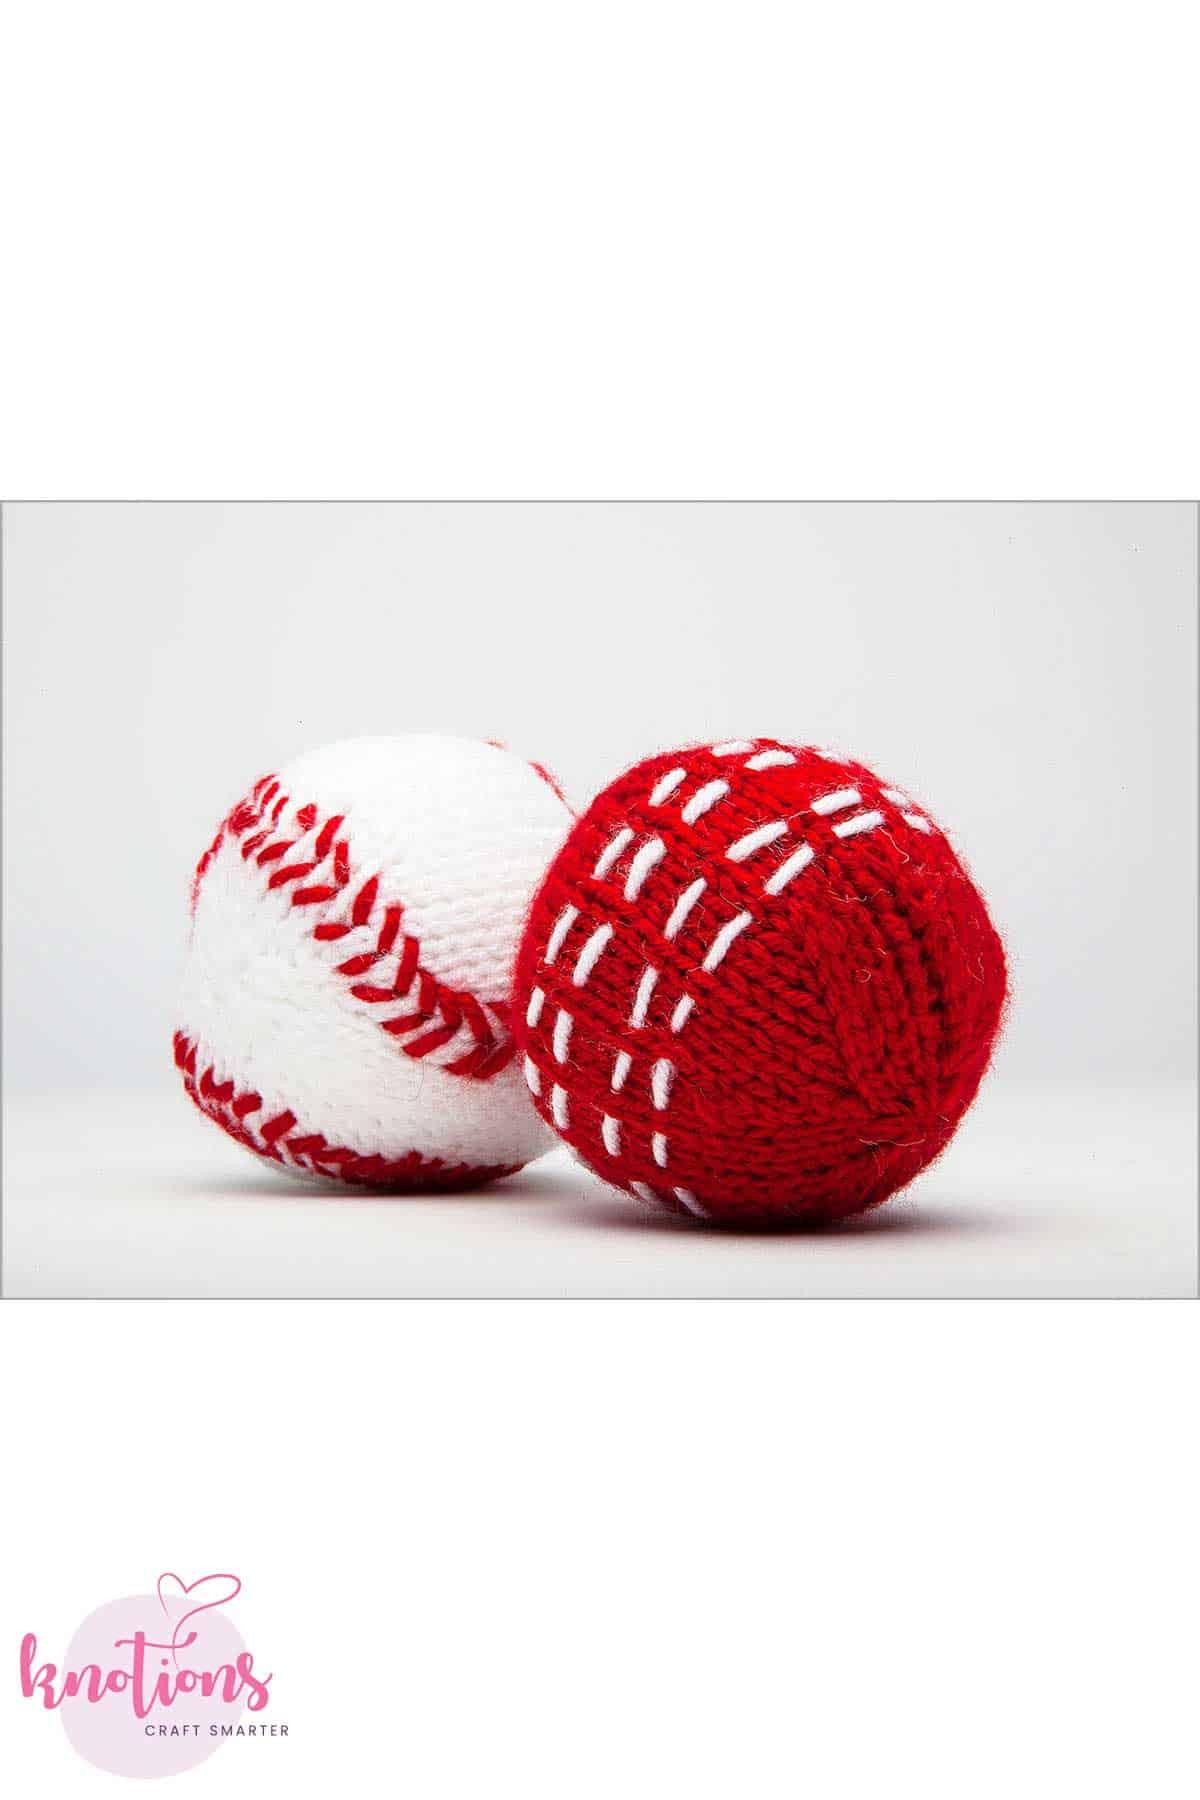 baseball-cricketball-6